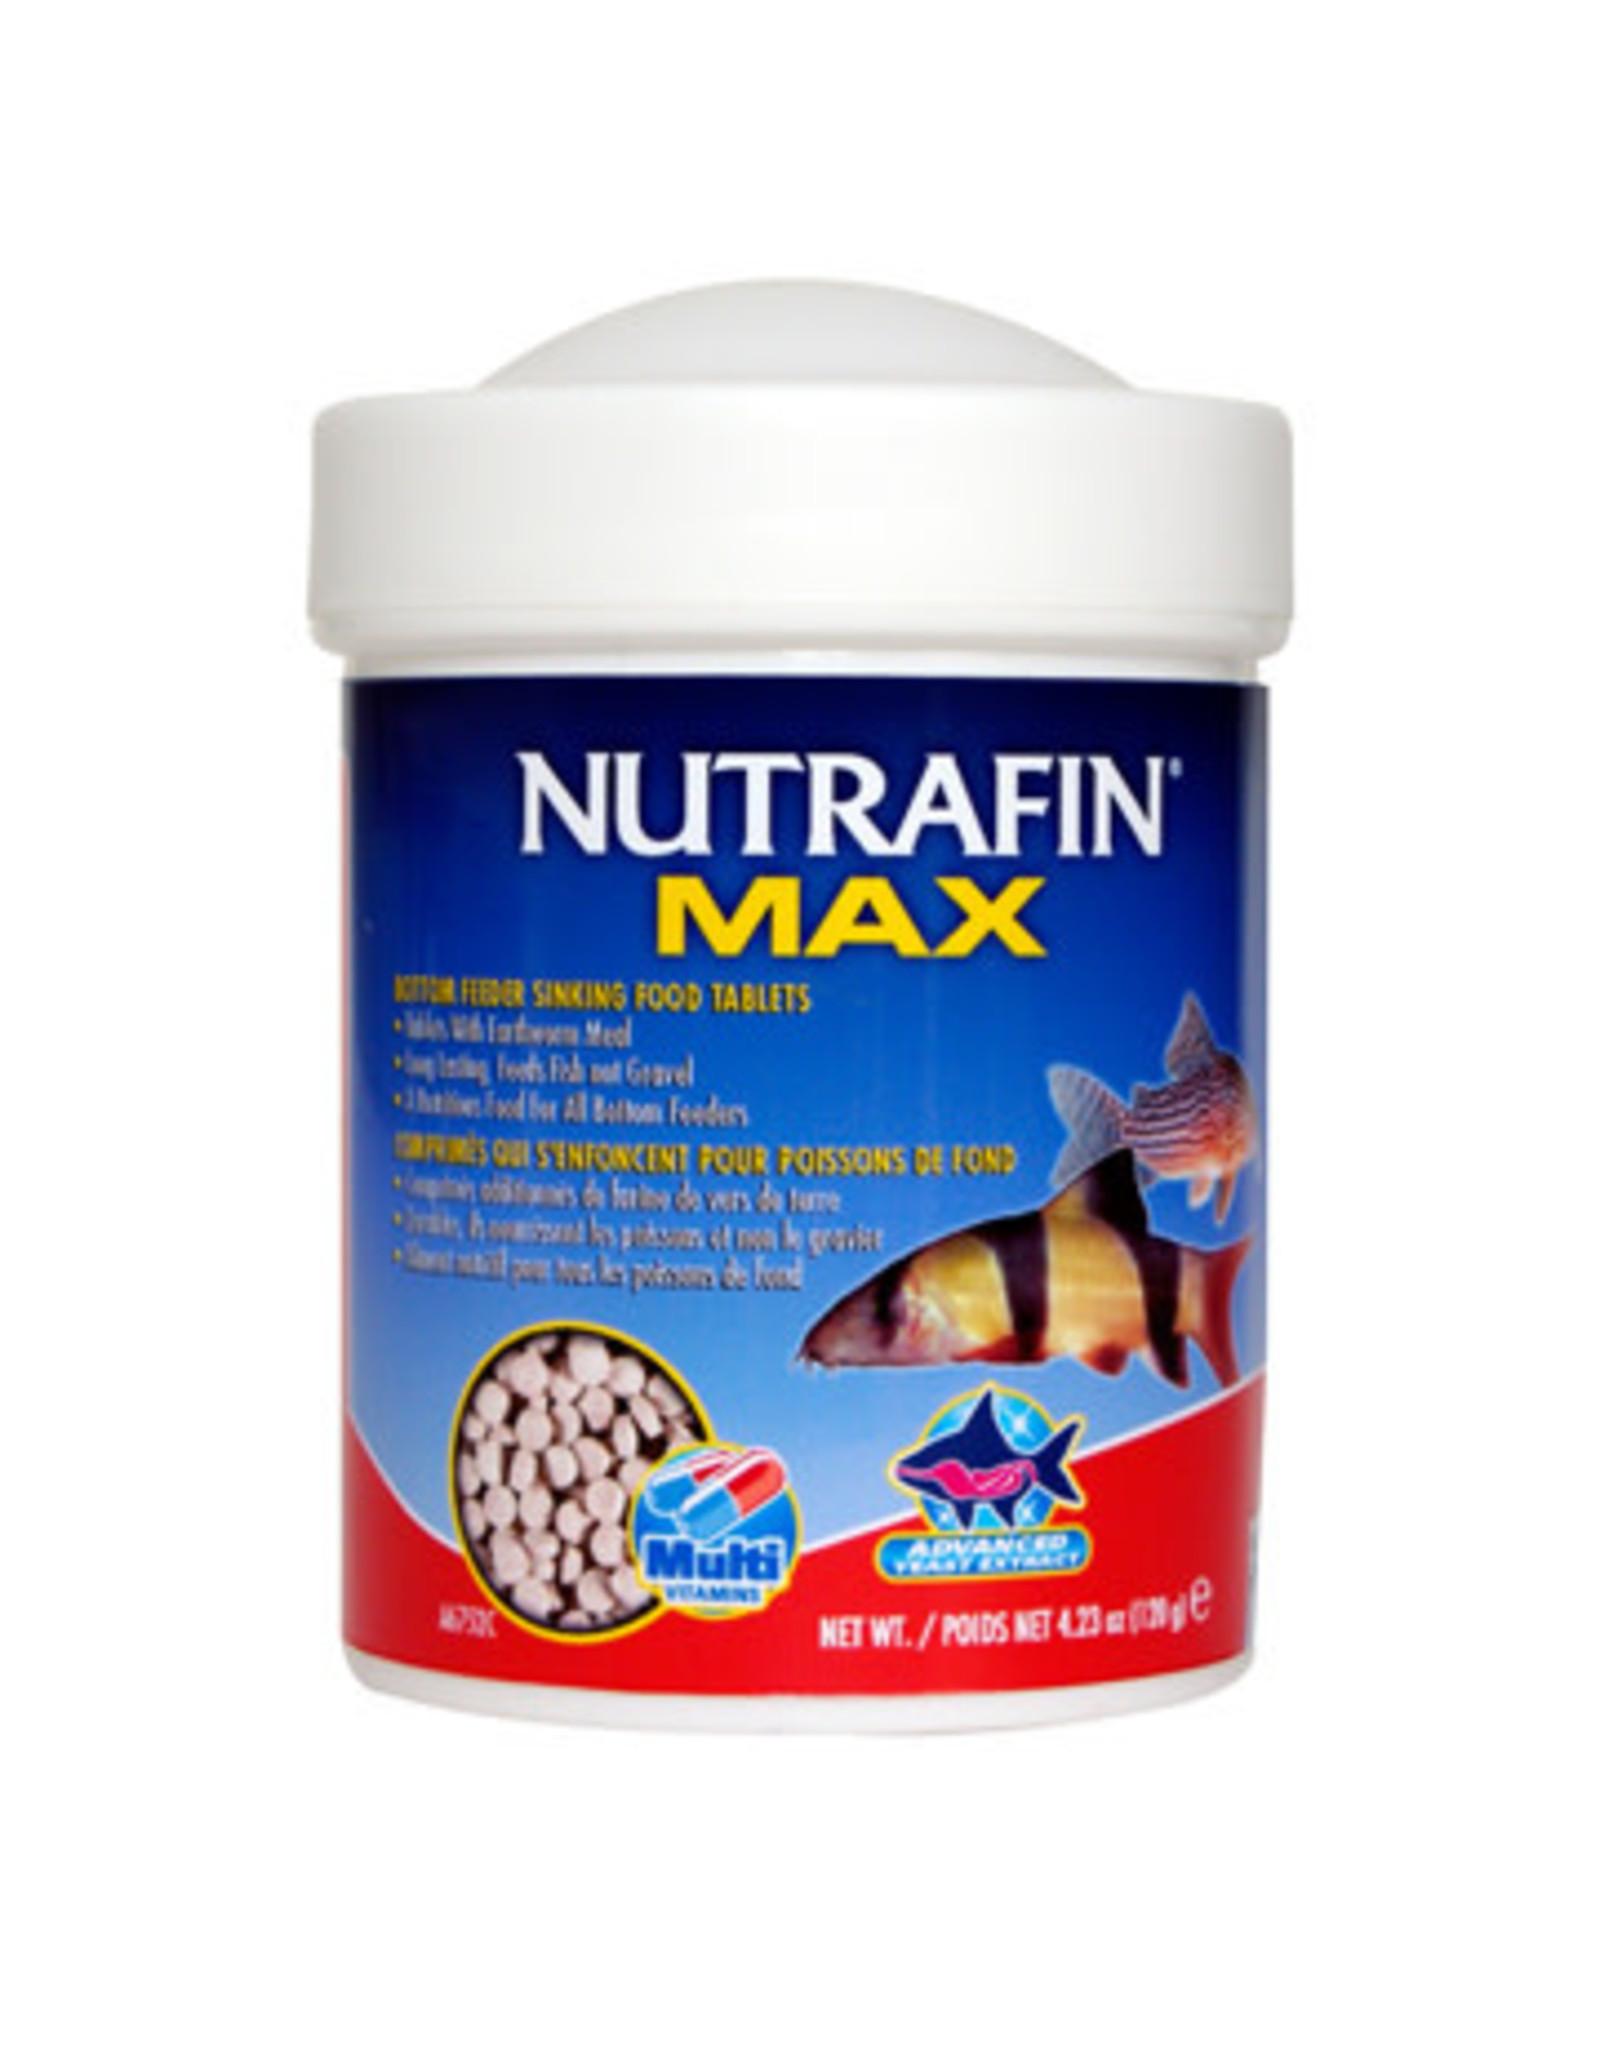 Nutrafin Nutrafin Max Bottom Feeder Sinking Food Tablets, 120 g (4.23 oz)